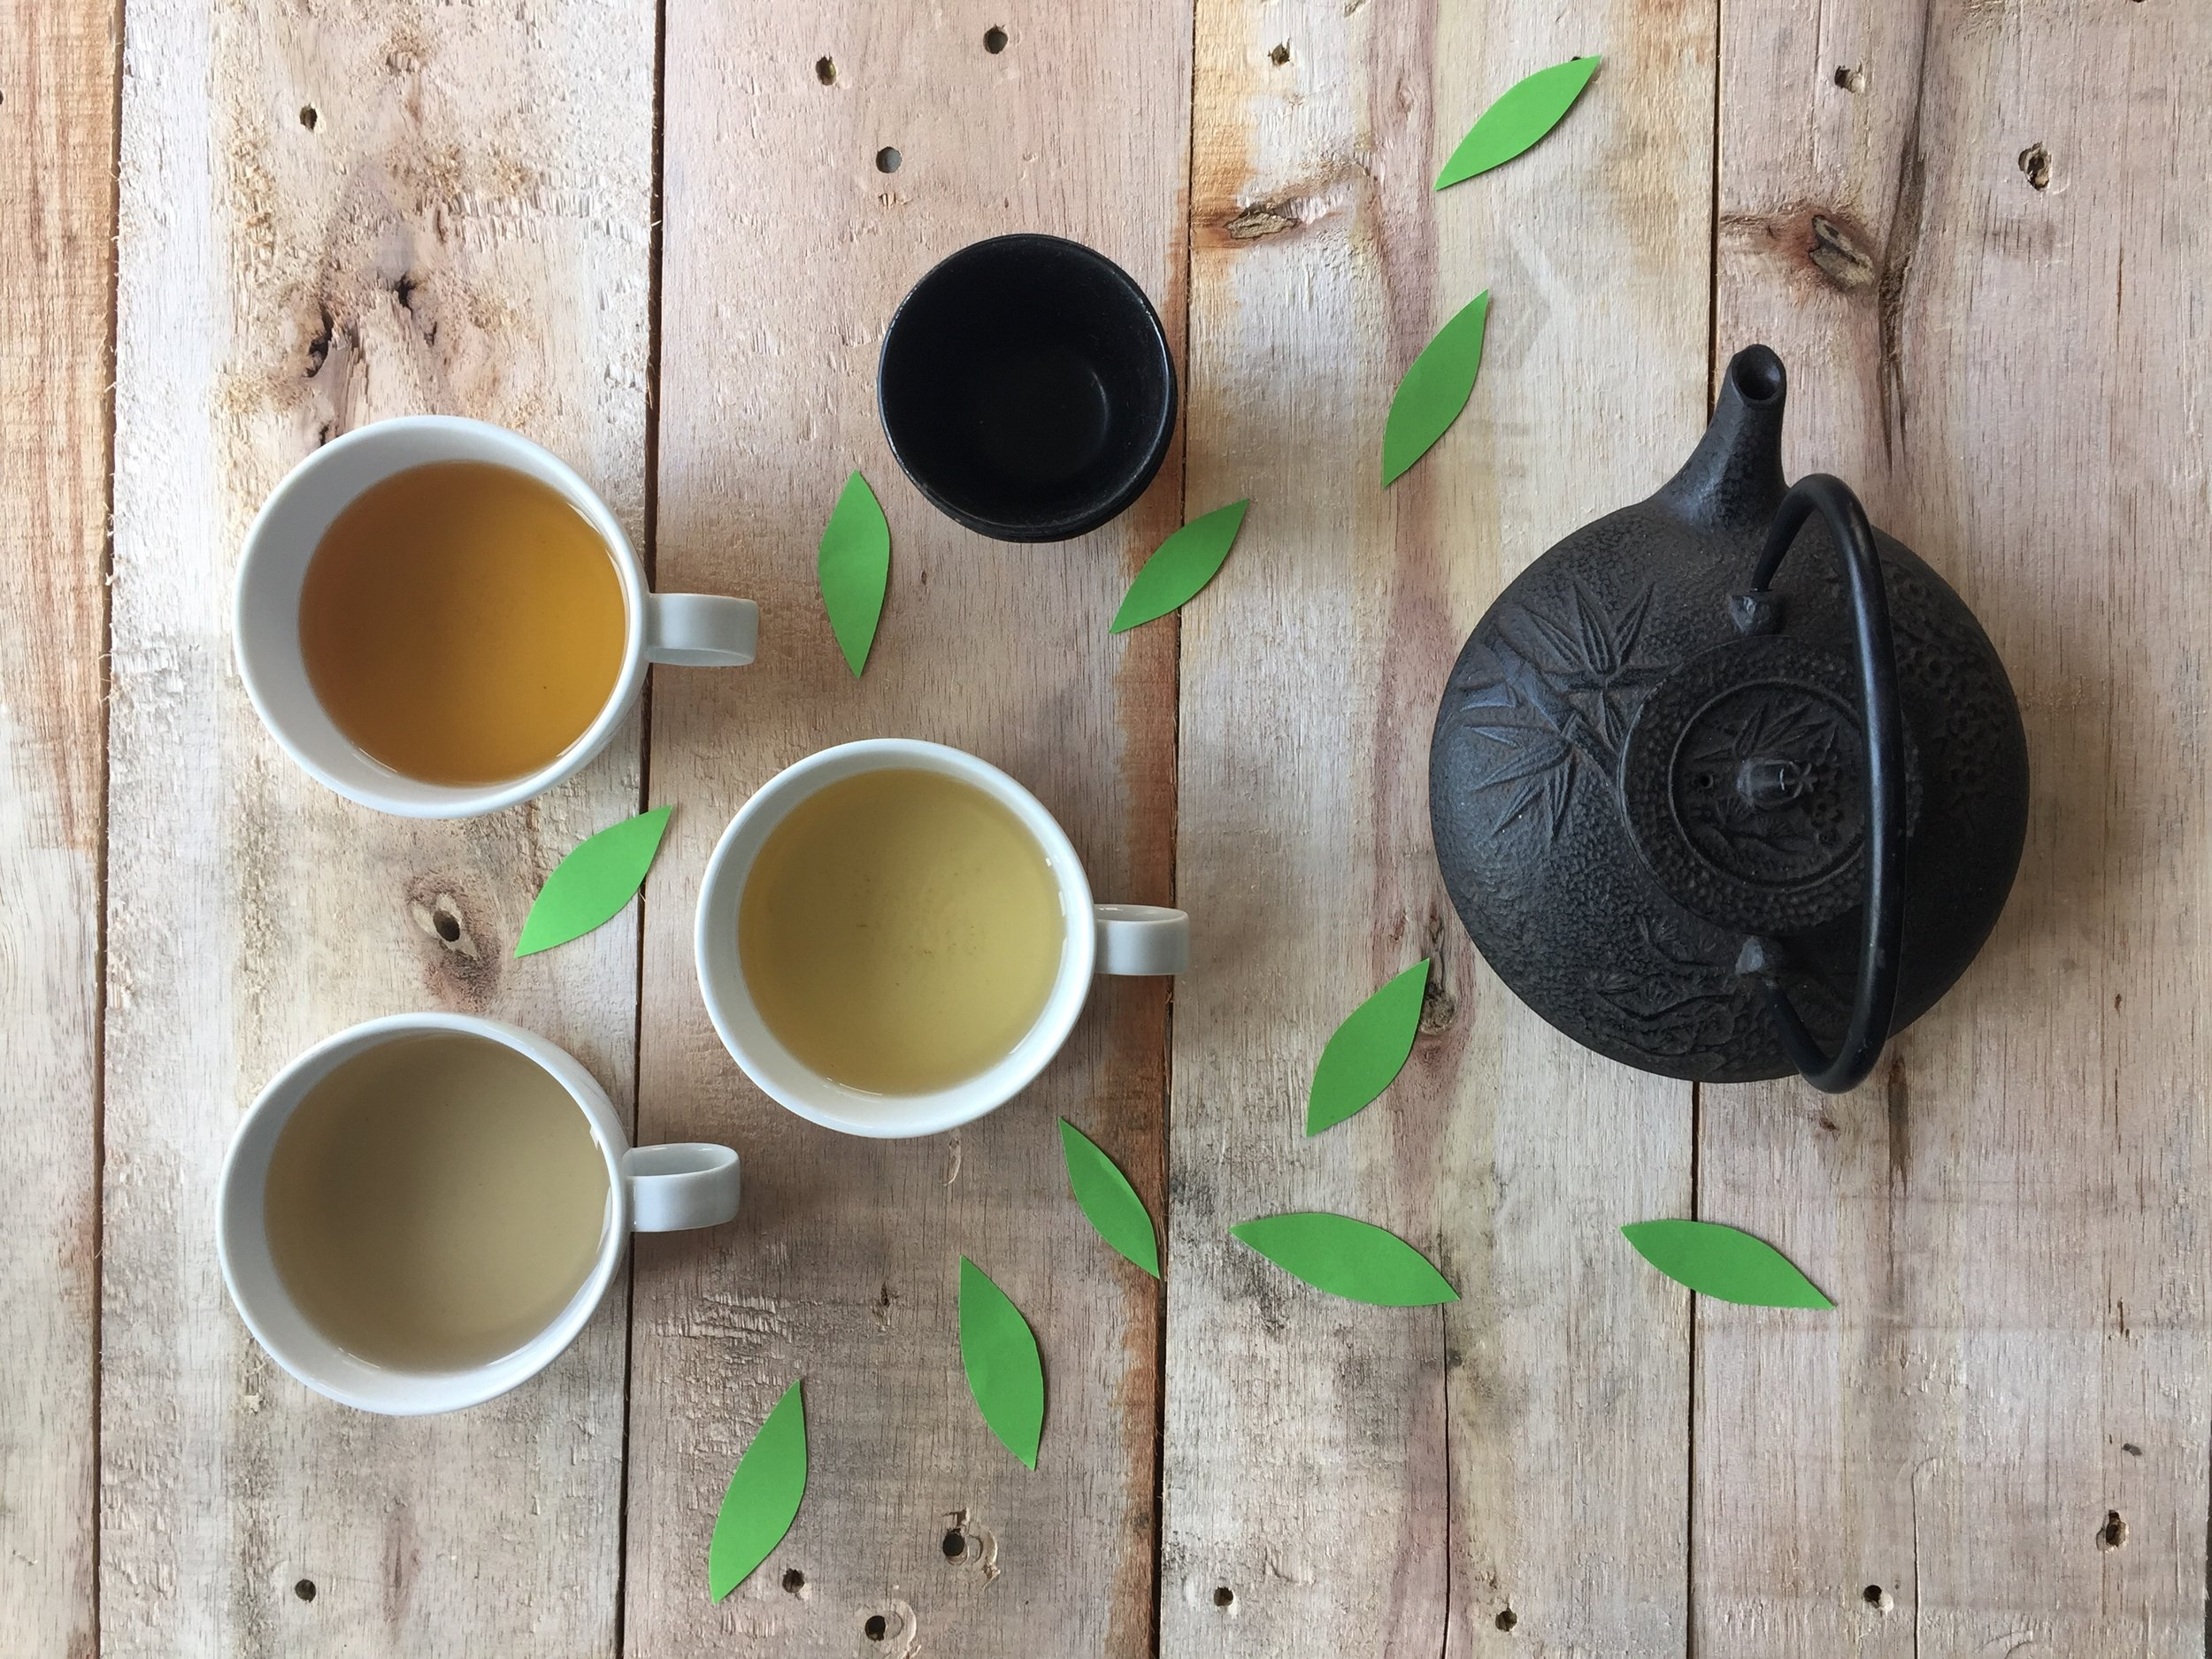 Other Tea - green tea subscription box - teapot